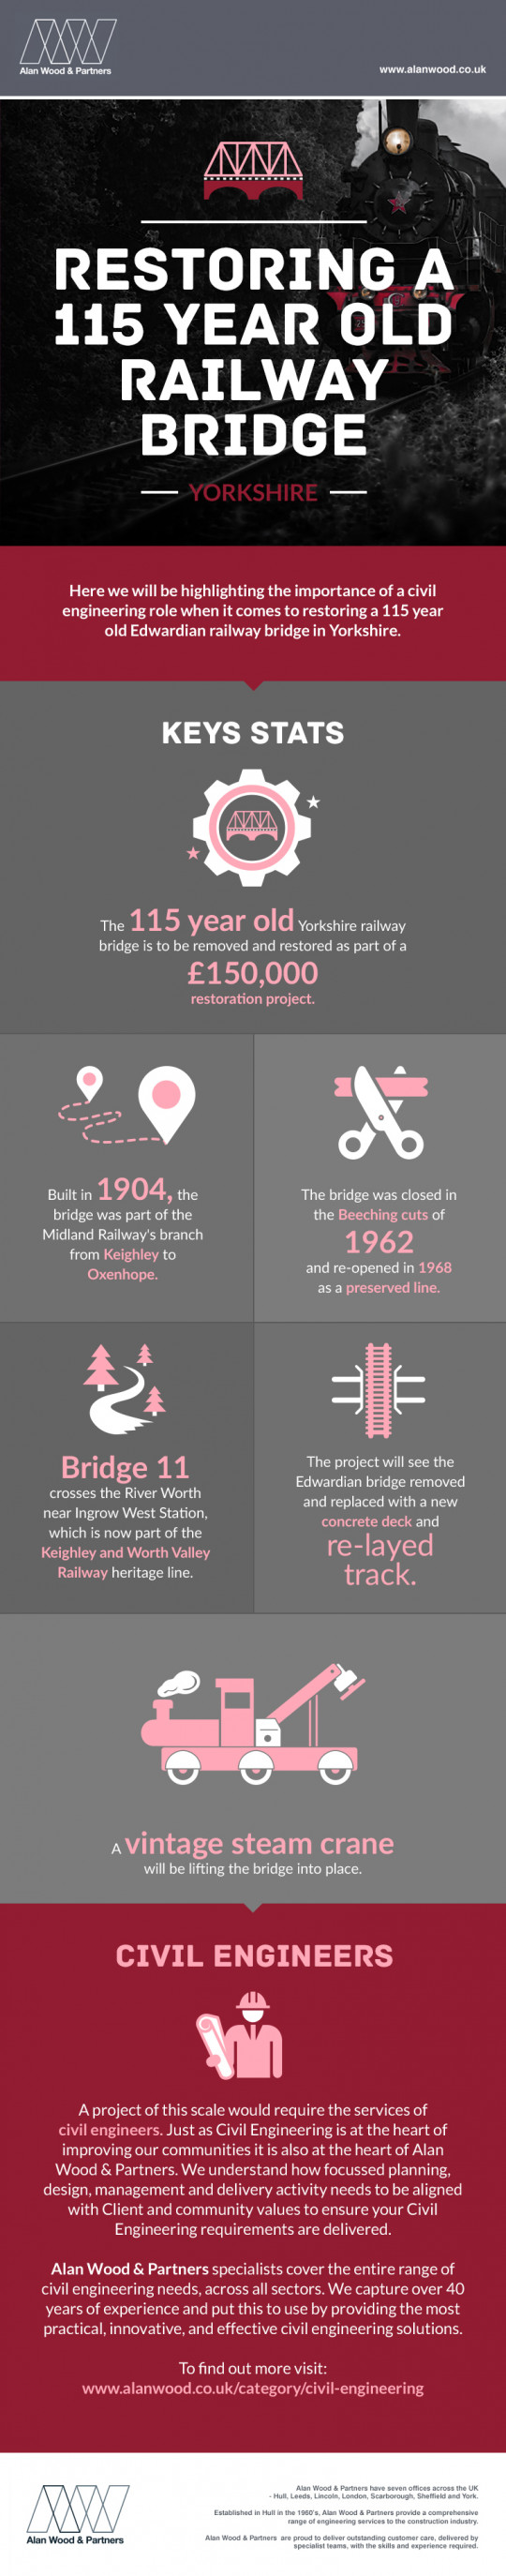 Restoring a 115 Year Old Railway Bridge